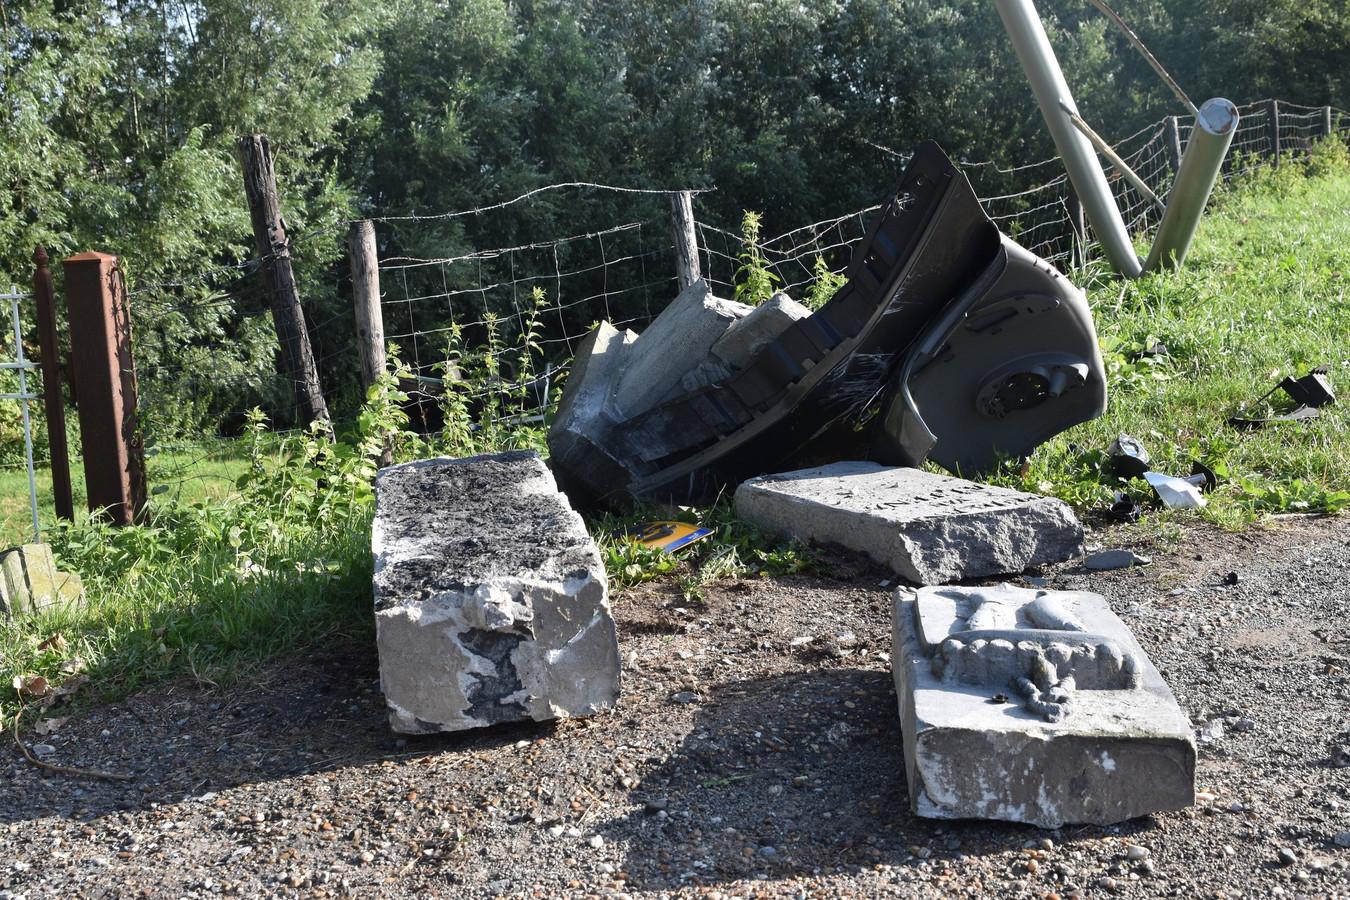 De beschadigde grenspalen, kort na de botsing op zondagochtend.